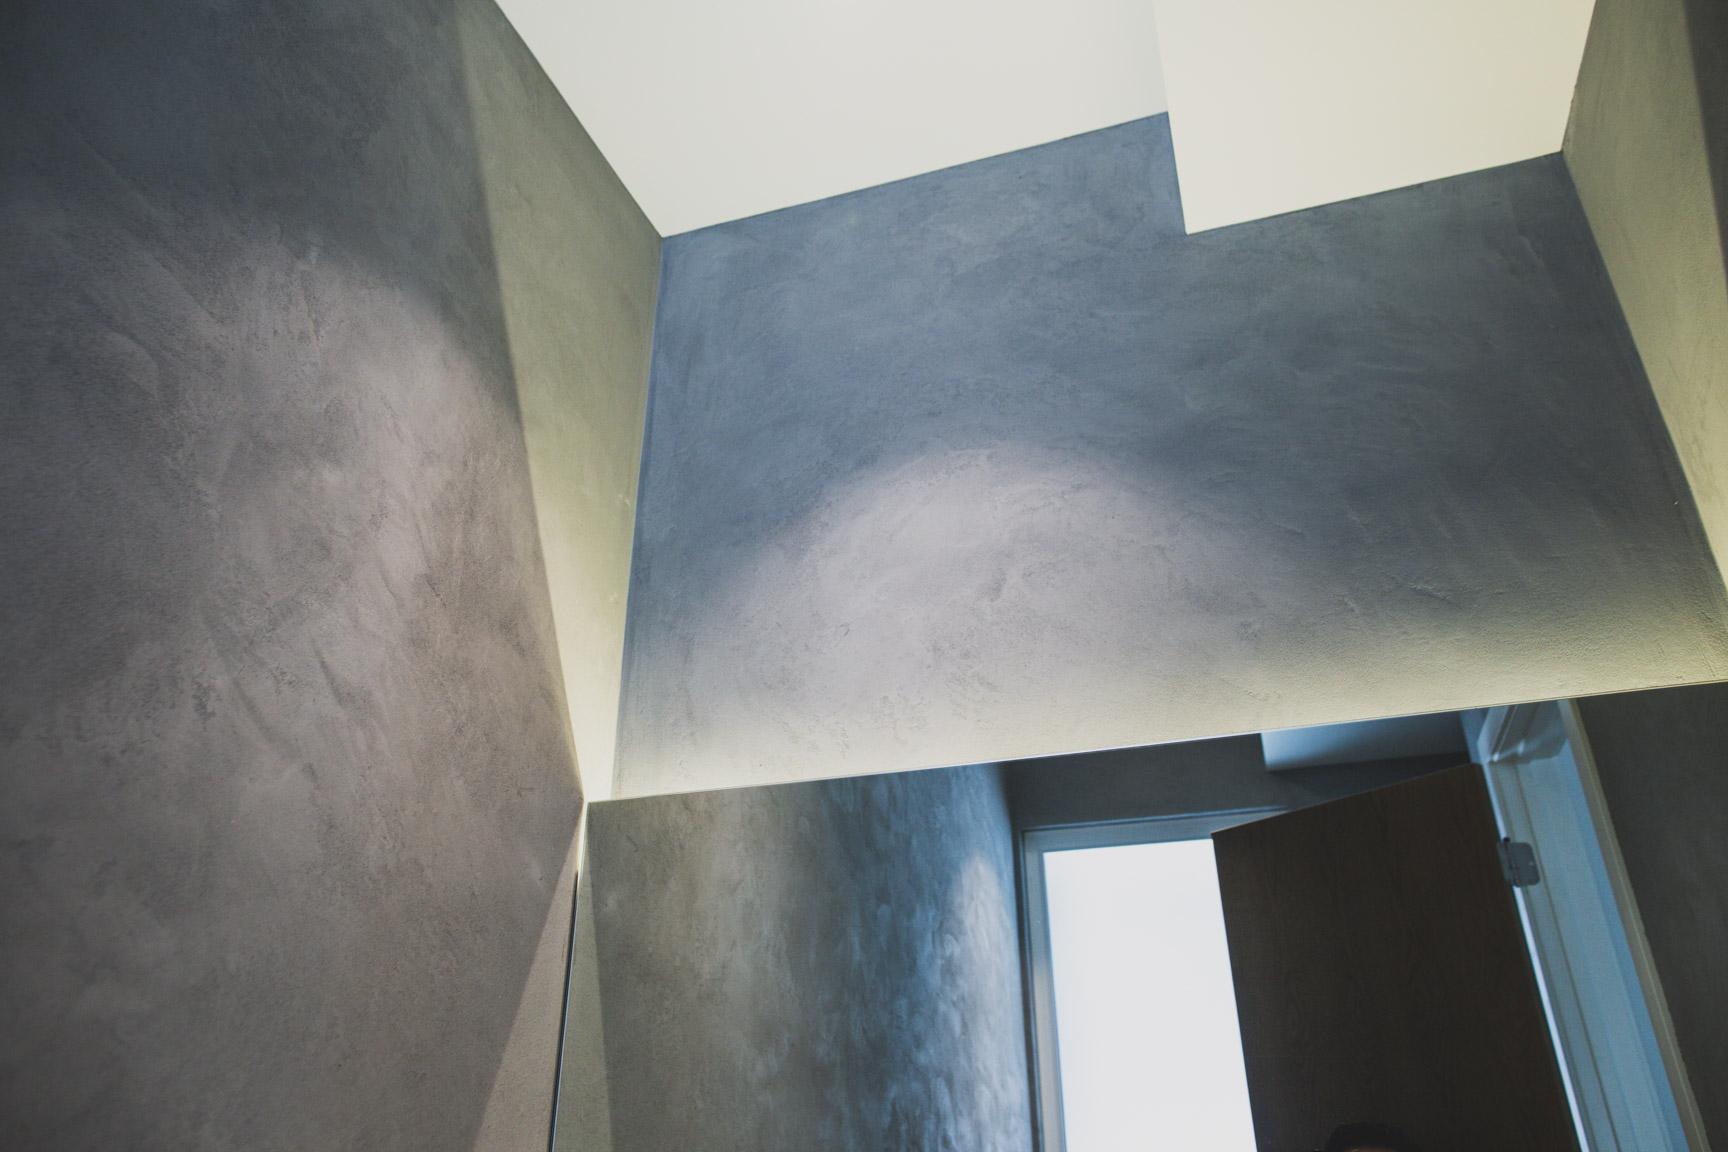 surfacedesign-26.jpg